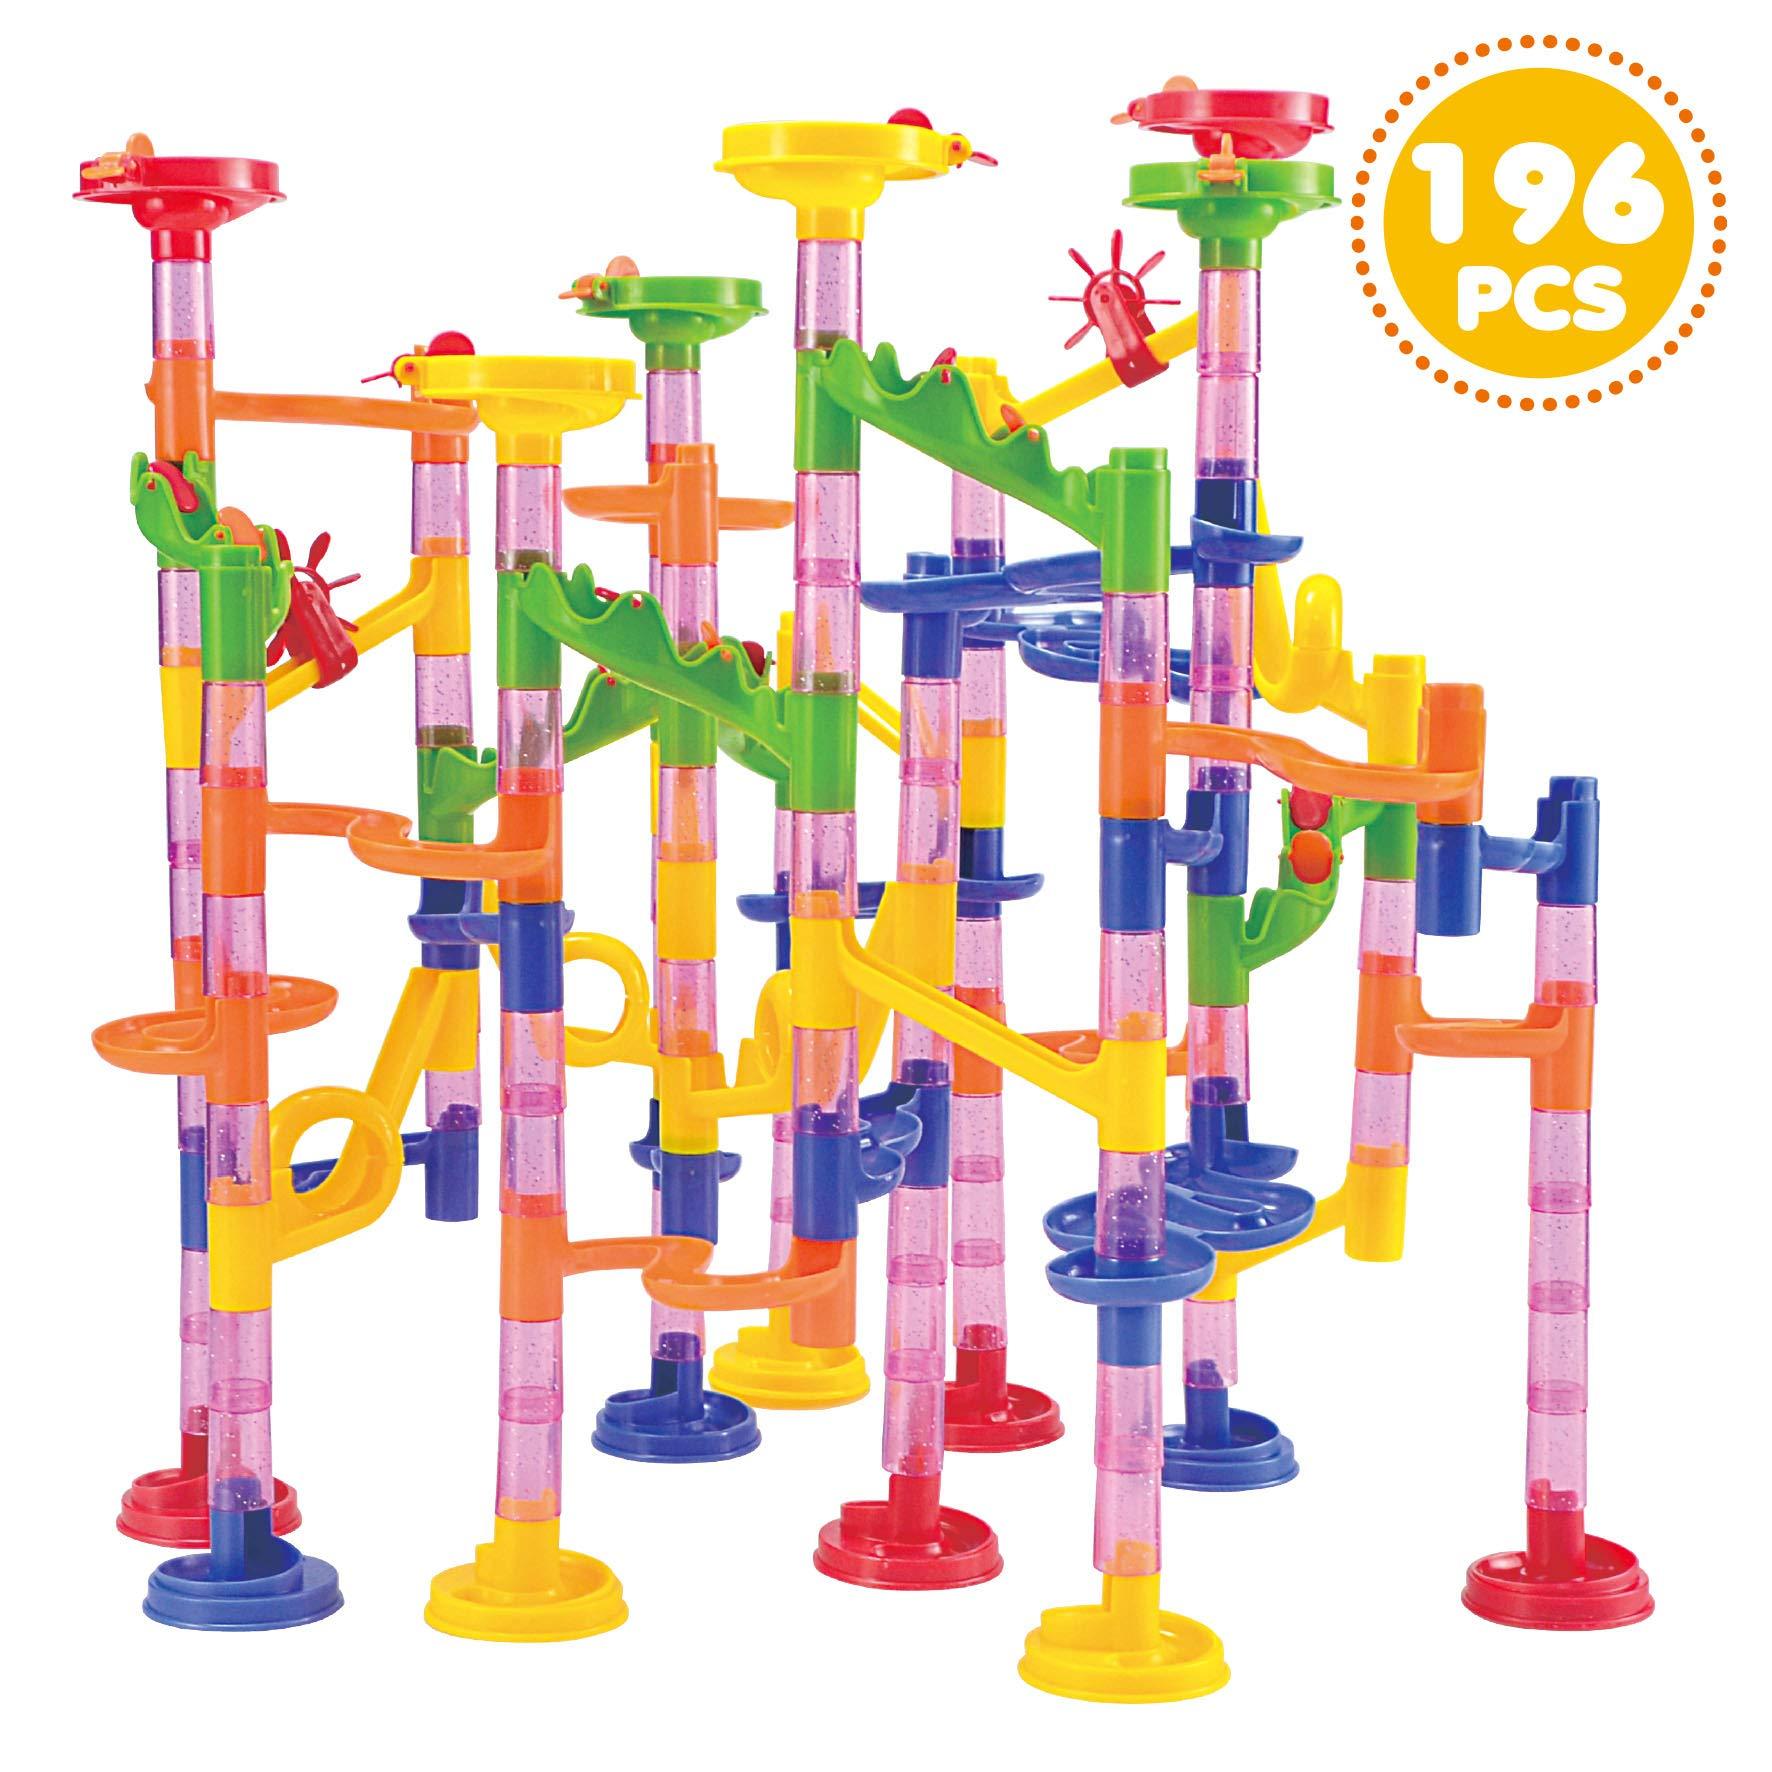 JOYIN 196 Pcs Marble Run Compact Set, Construction Building Blocks Toys, STEM Learning Toy, Educational Building Block Toy(156 Translucent Plastic Pieces+ 40 Glass Marbles)